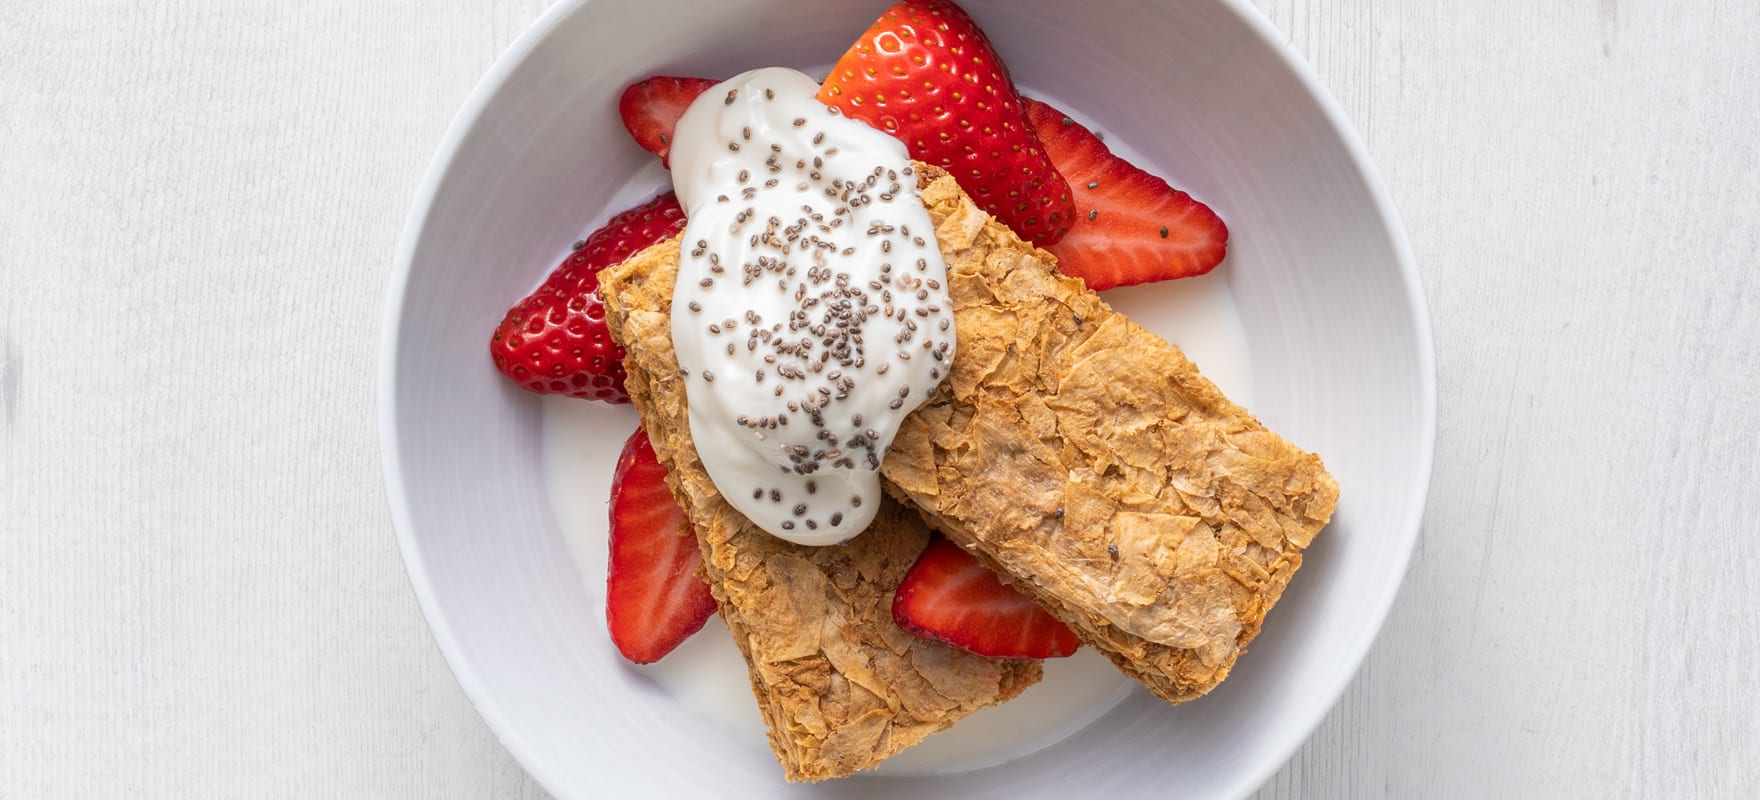 Weet-Bix™ with strawberries, yoghurt and chia seeds image 1